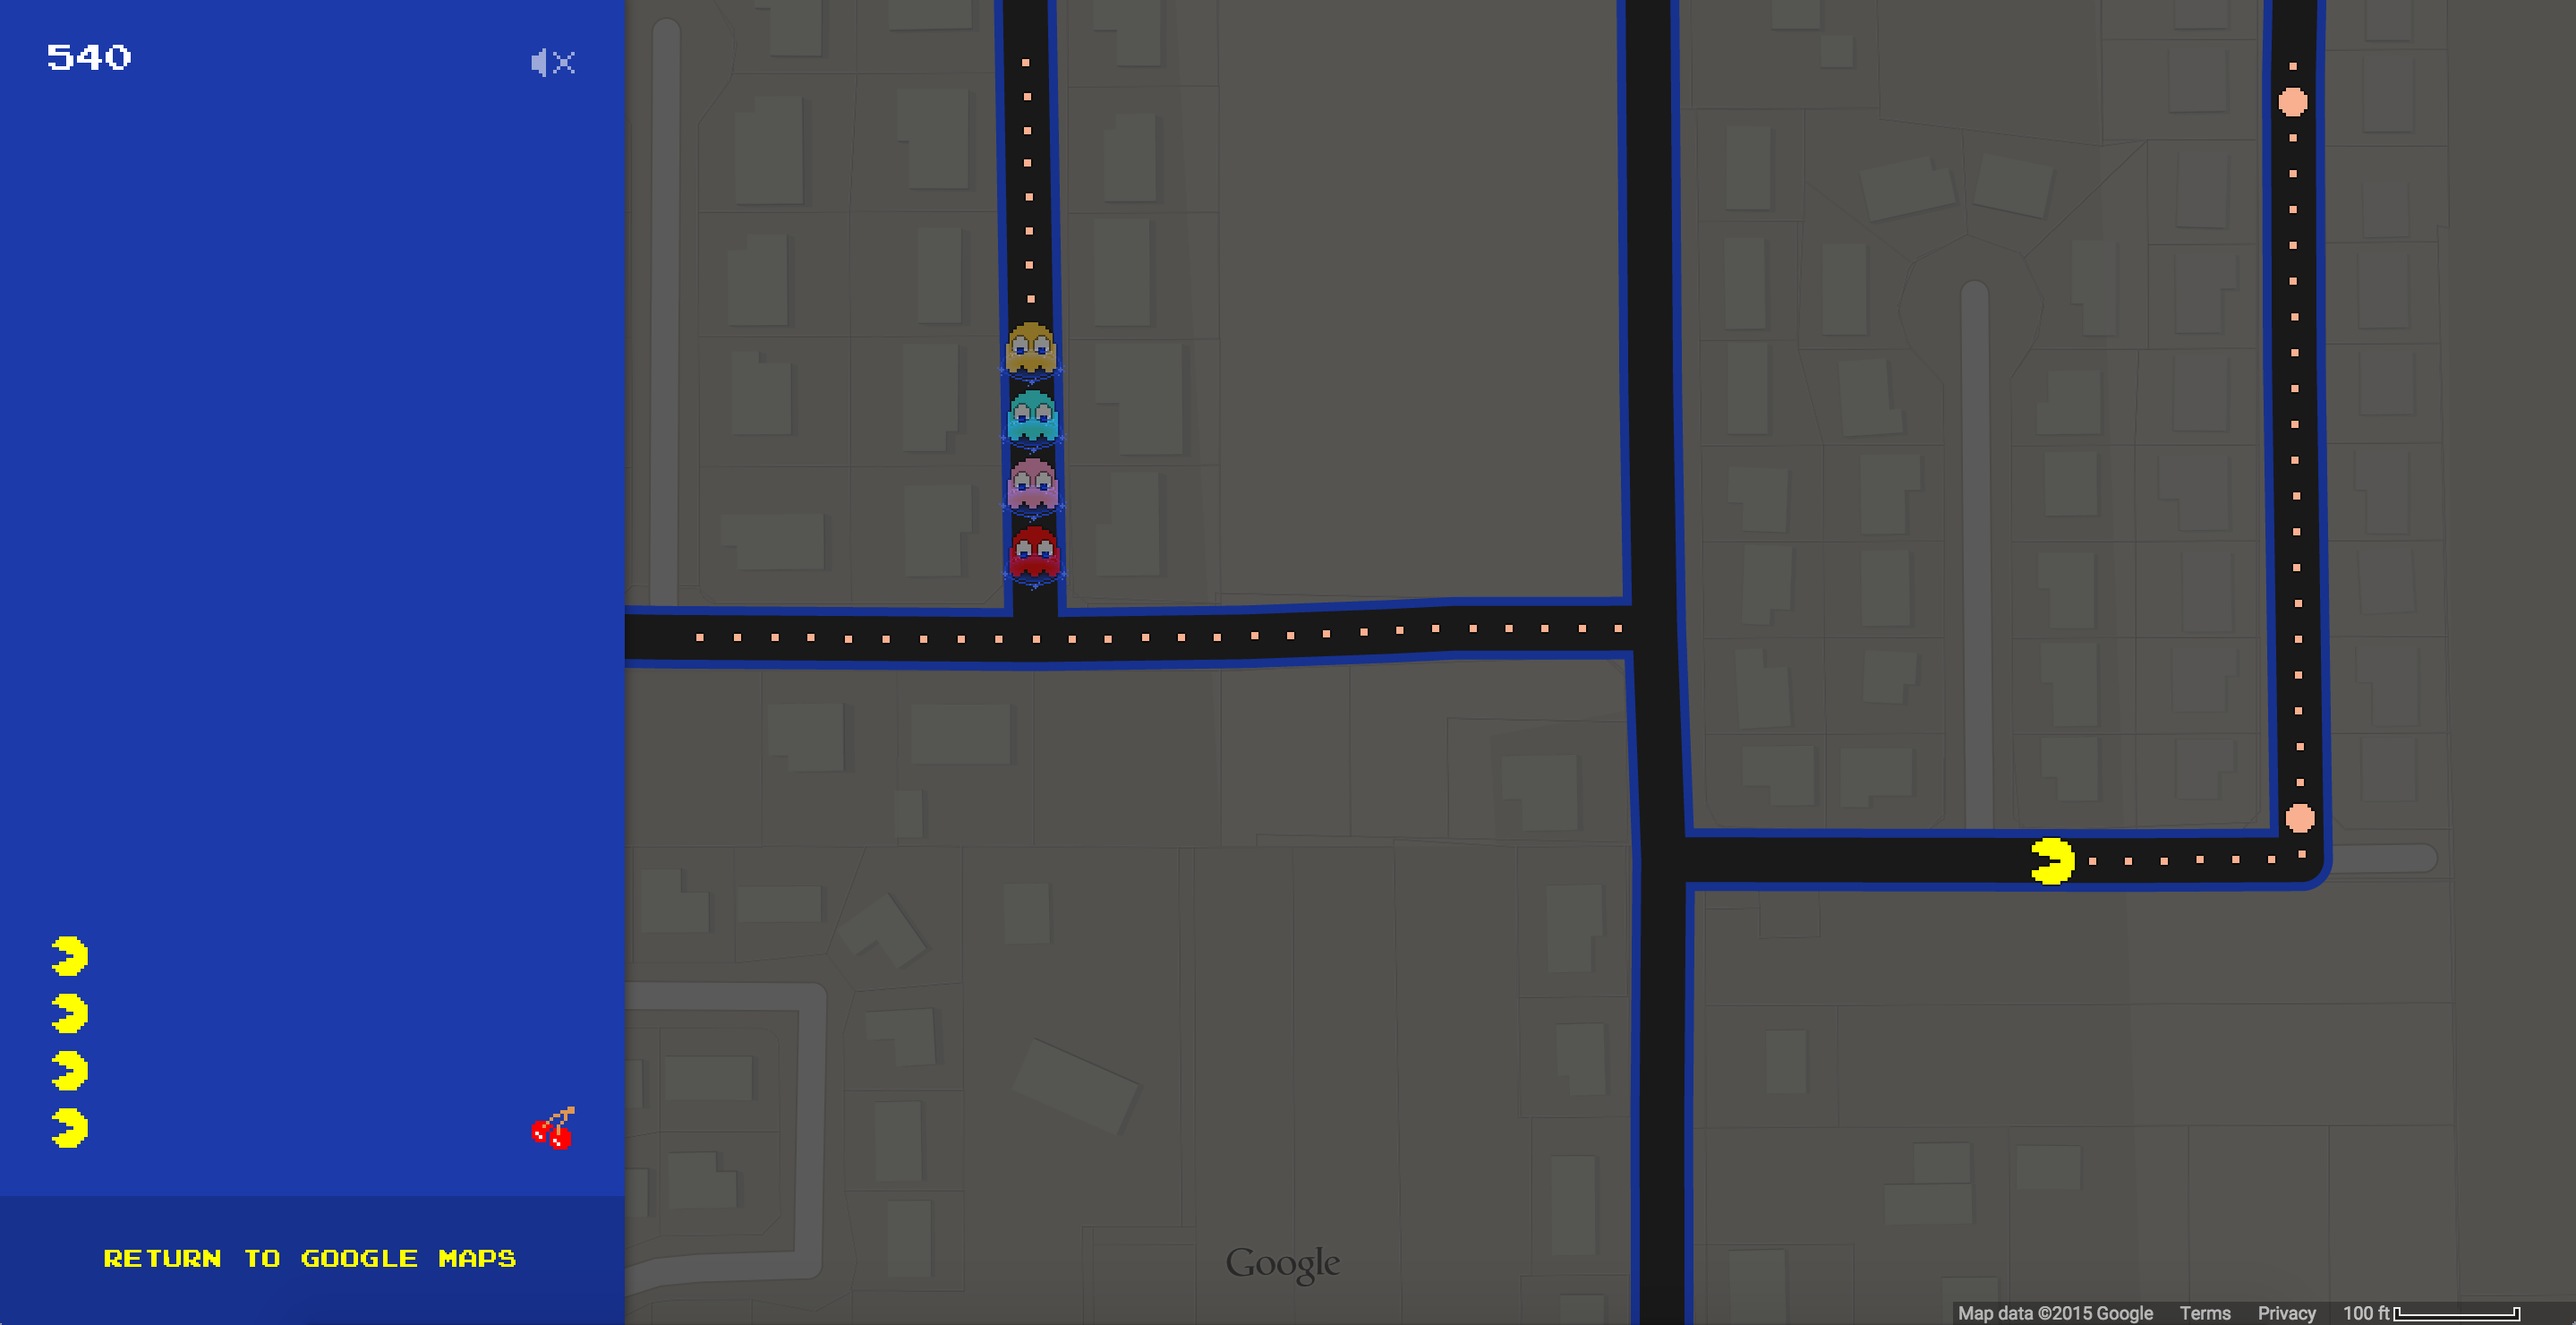 Google map's Pac Man